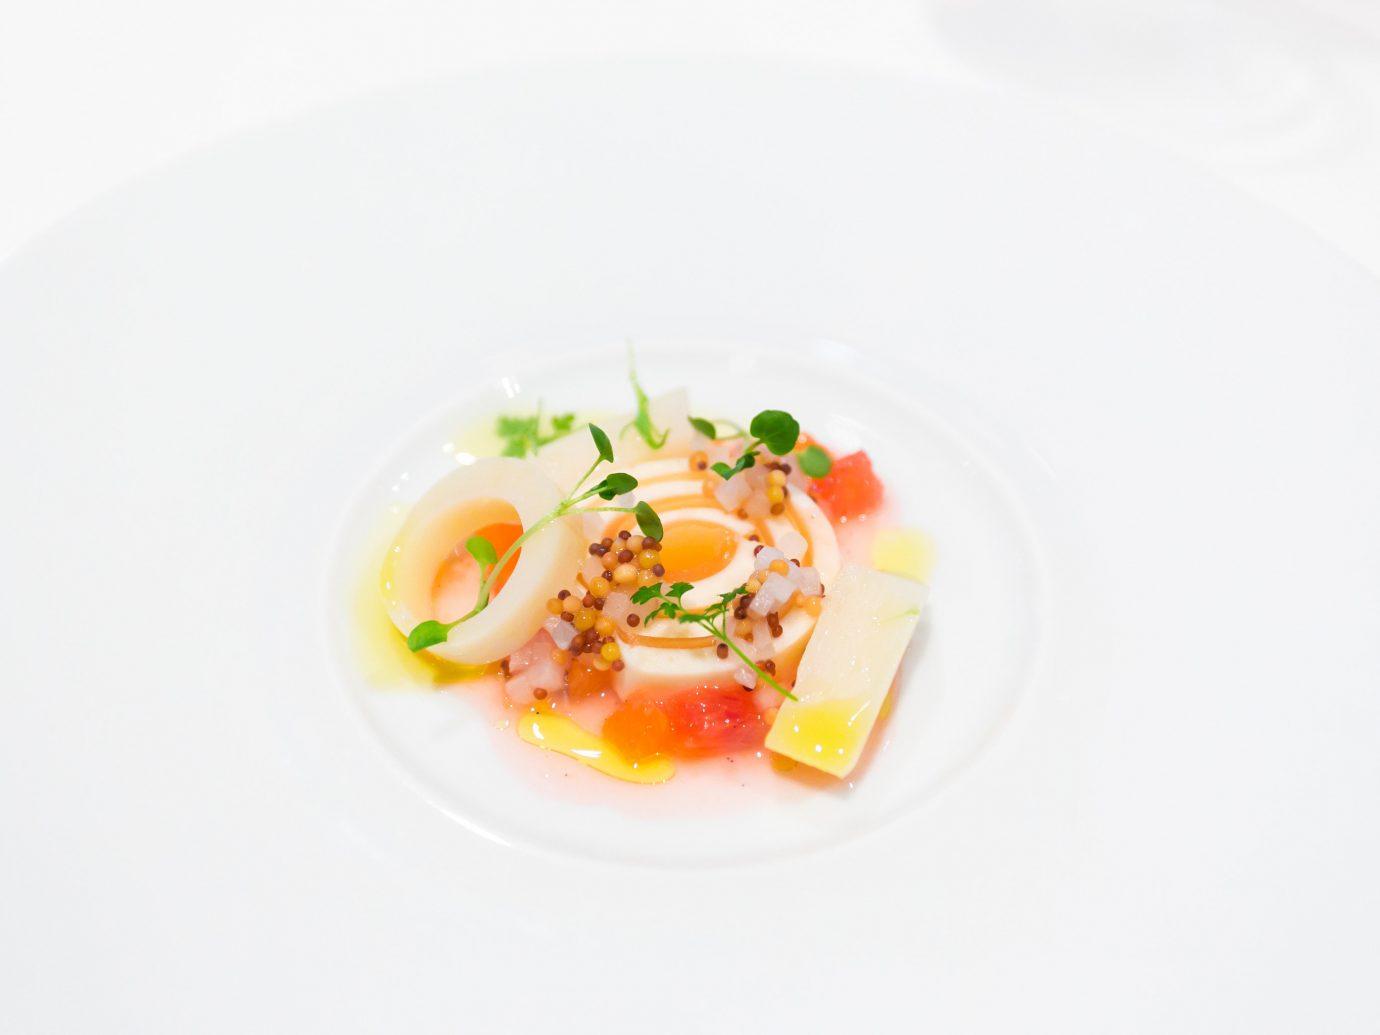 Hotels Romance Spa Retreats Trip Ideas plate food dish cuisine meal fish produce white vegetable breakfast soup piece de resistance